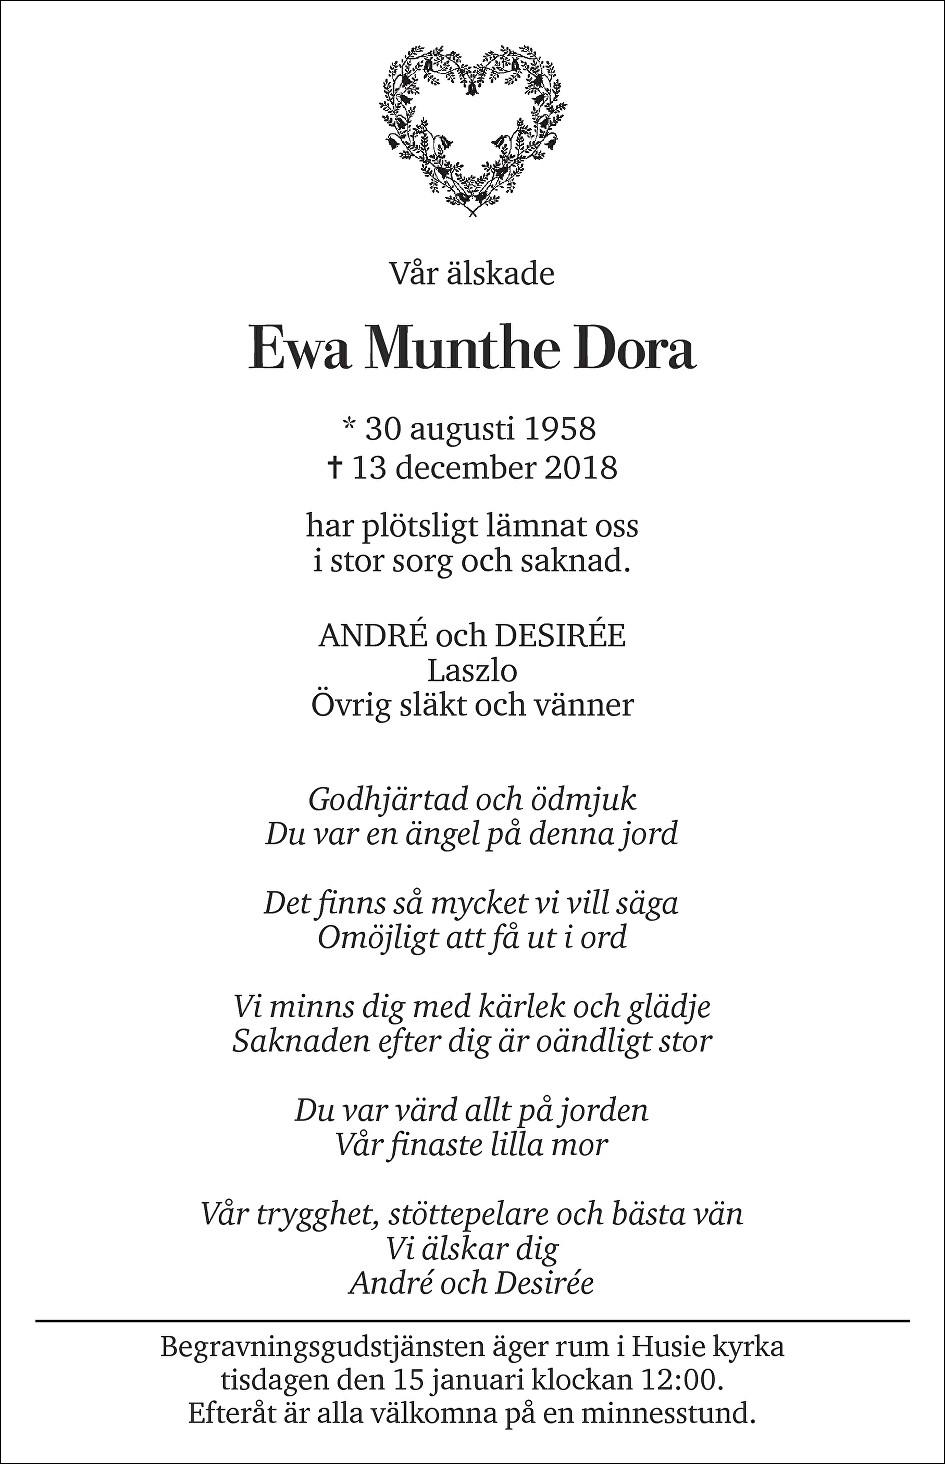 Ewa Munthe Dora Death notice